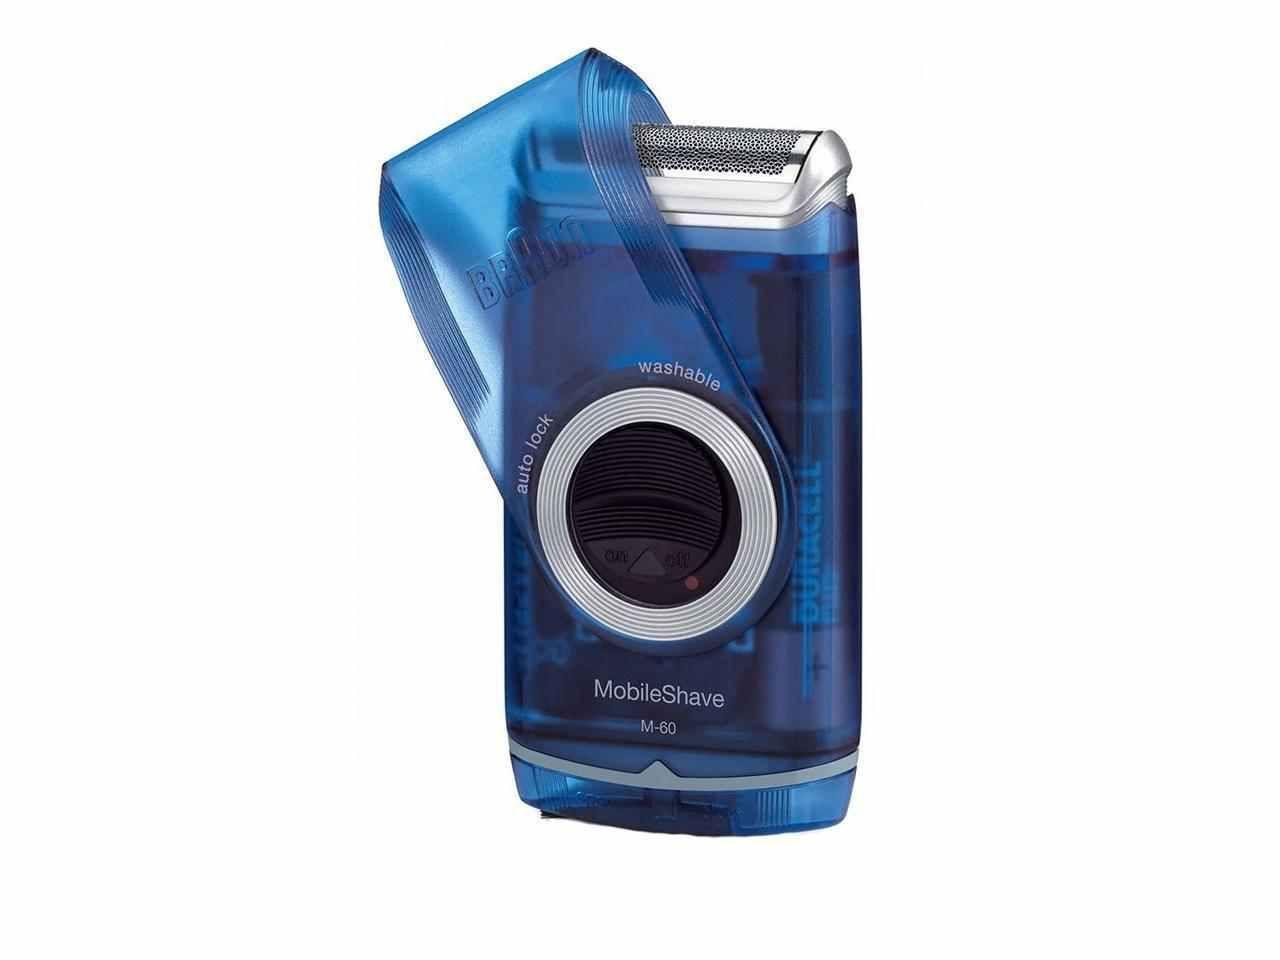 Braun m60 mobile shaver washable portable electric shaver